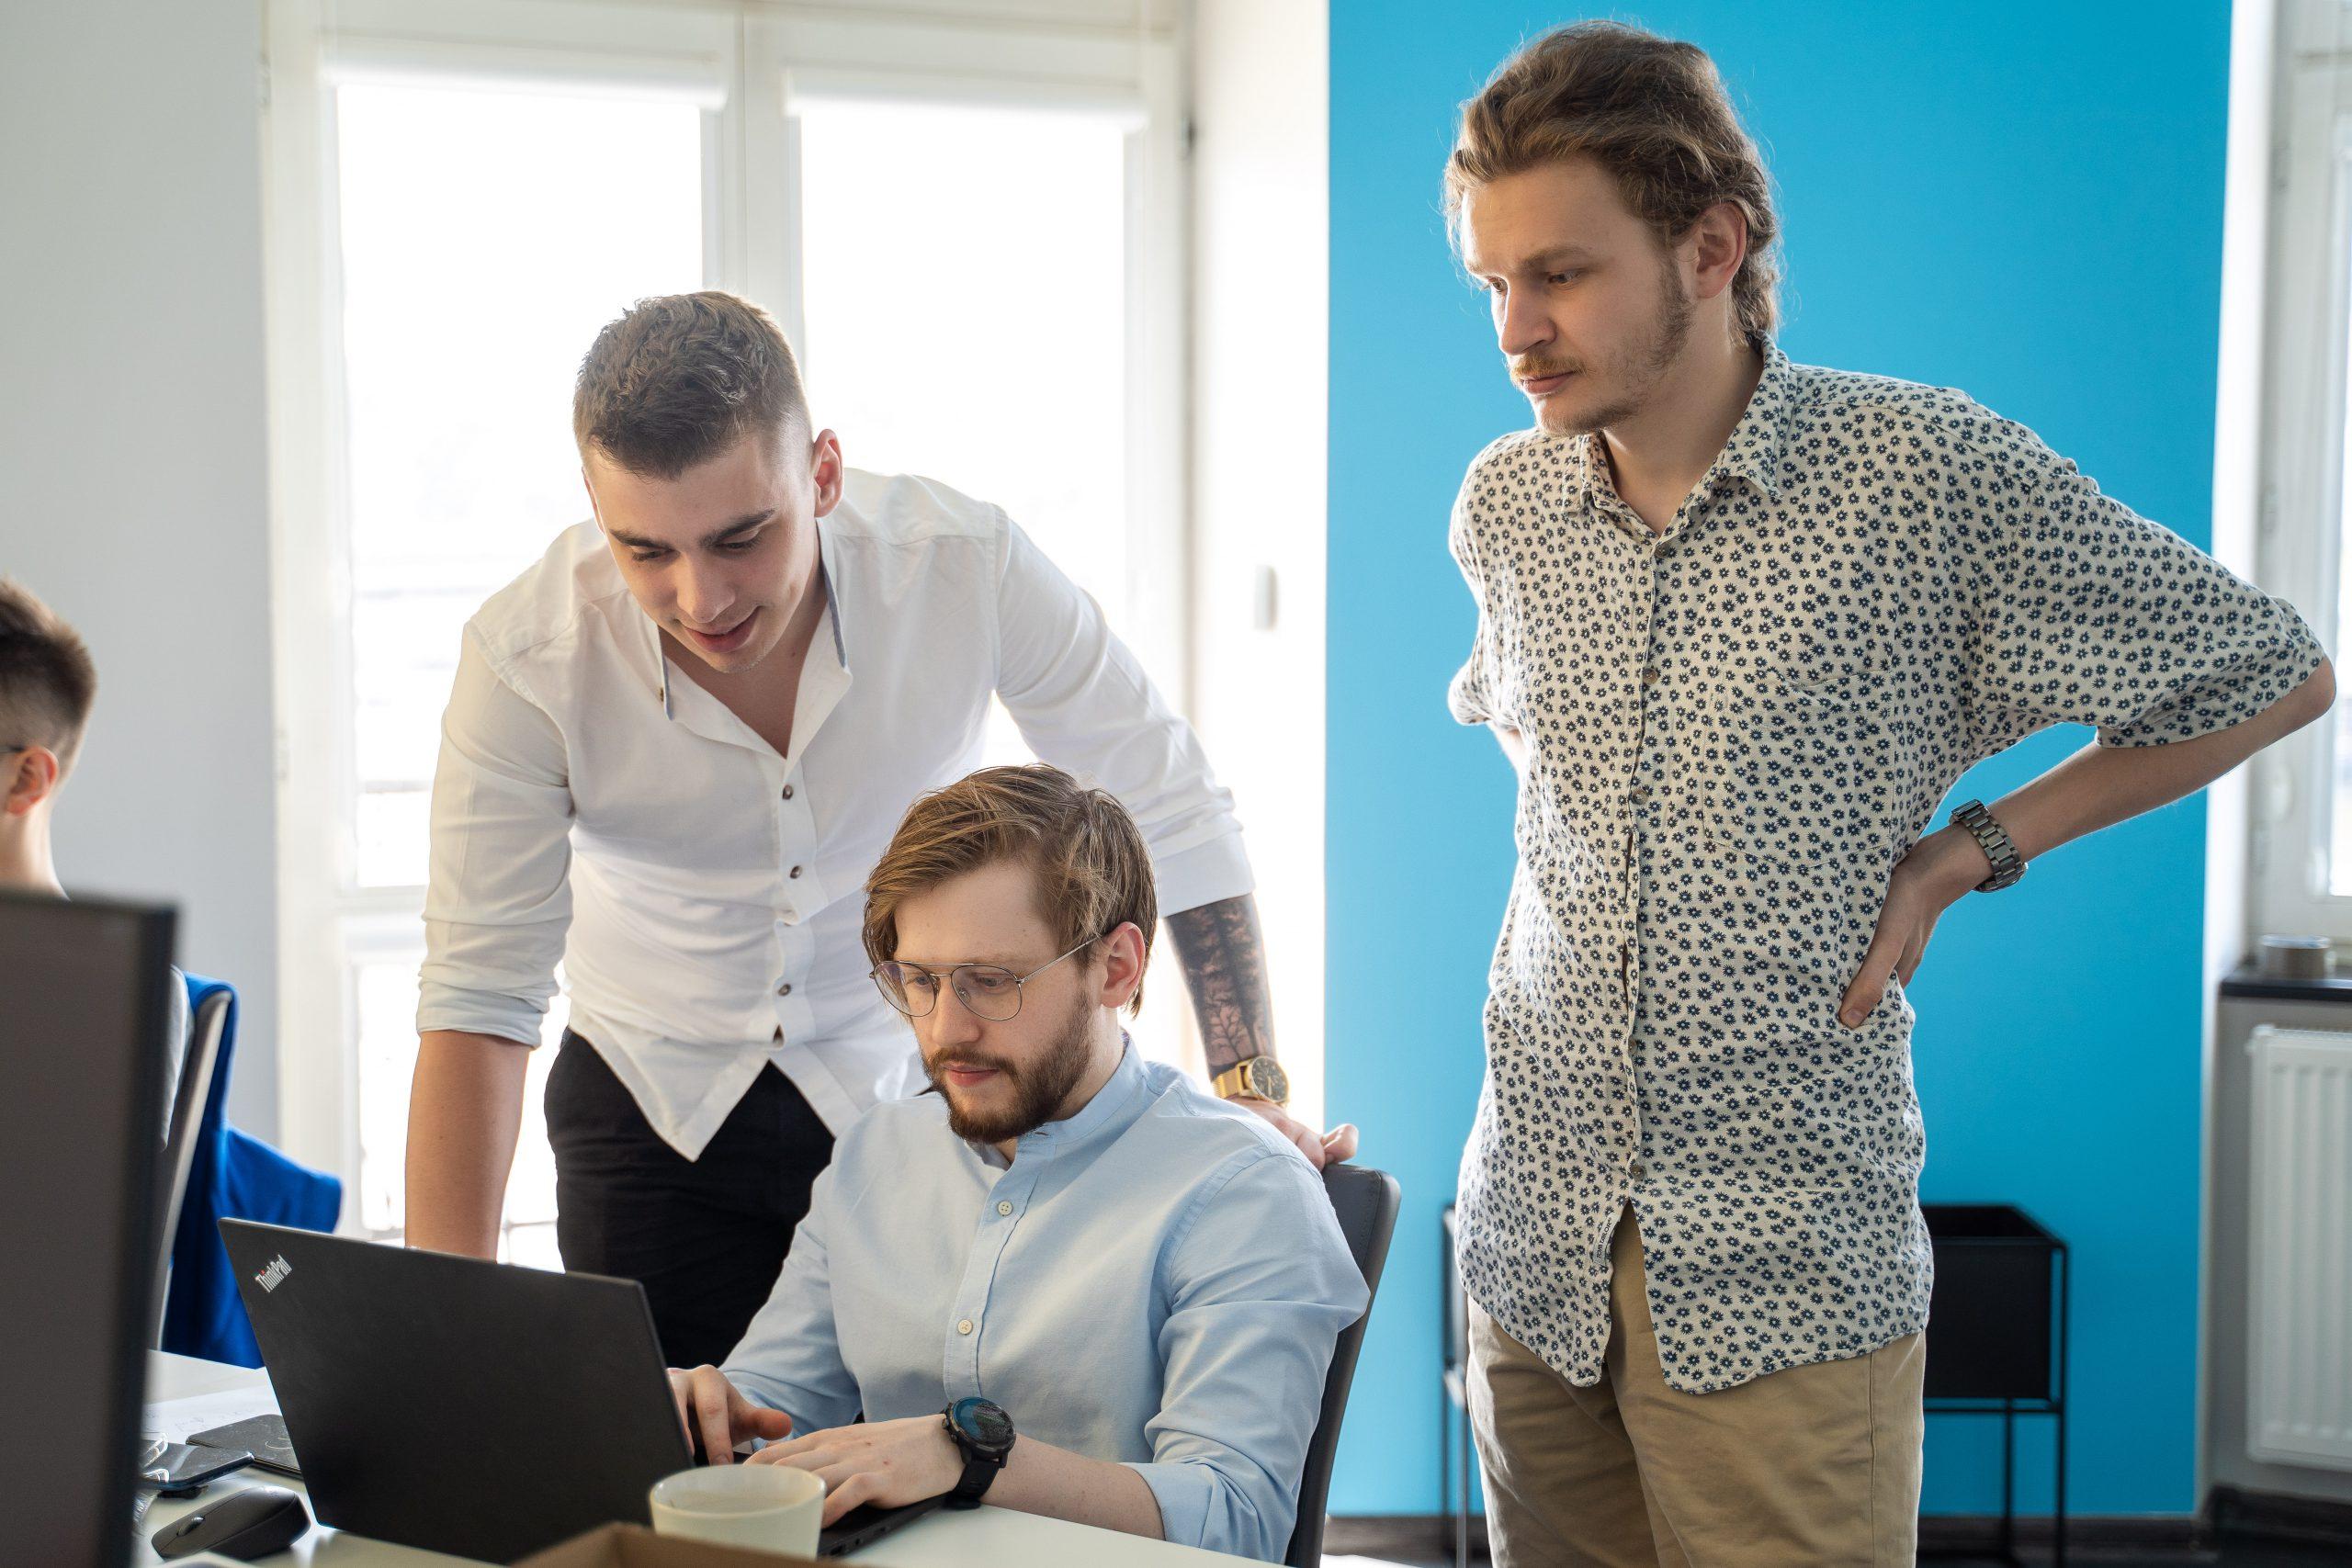 CrustLab software development experts